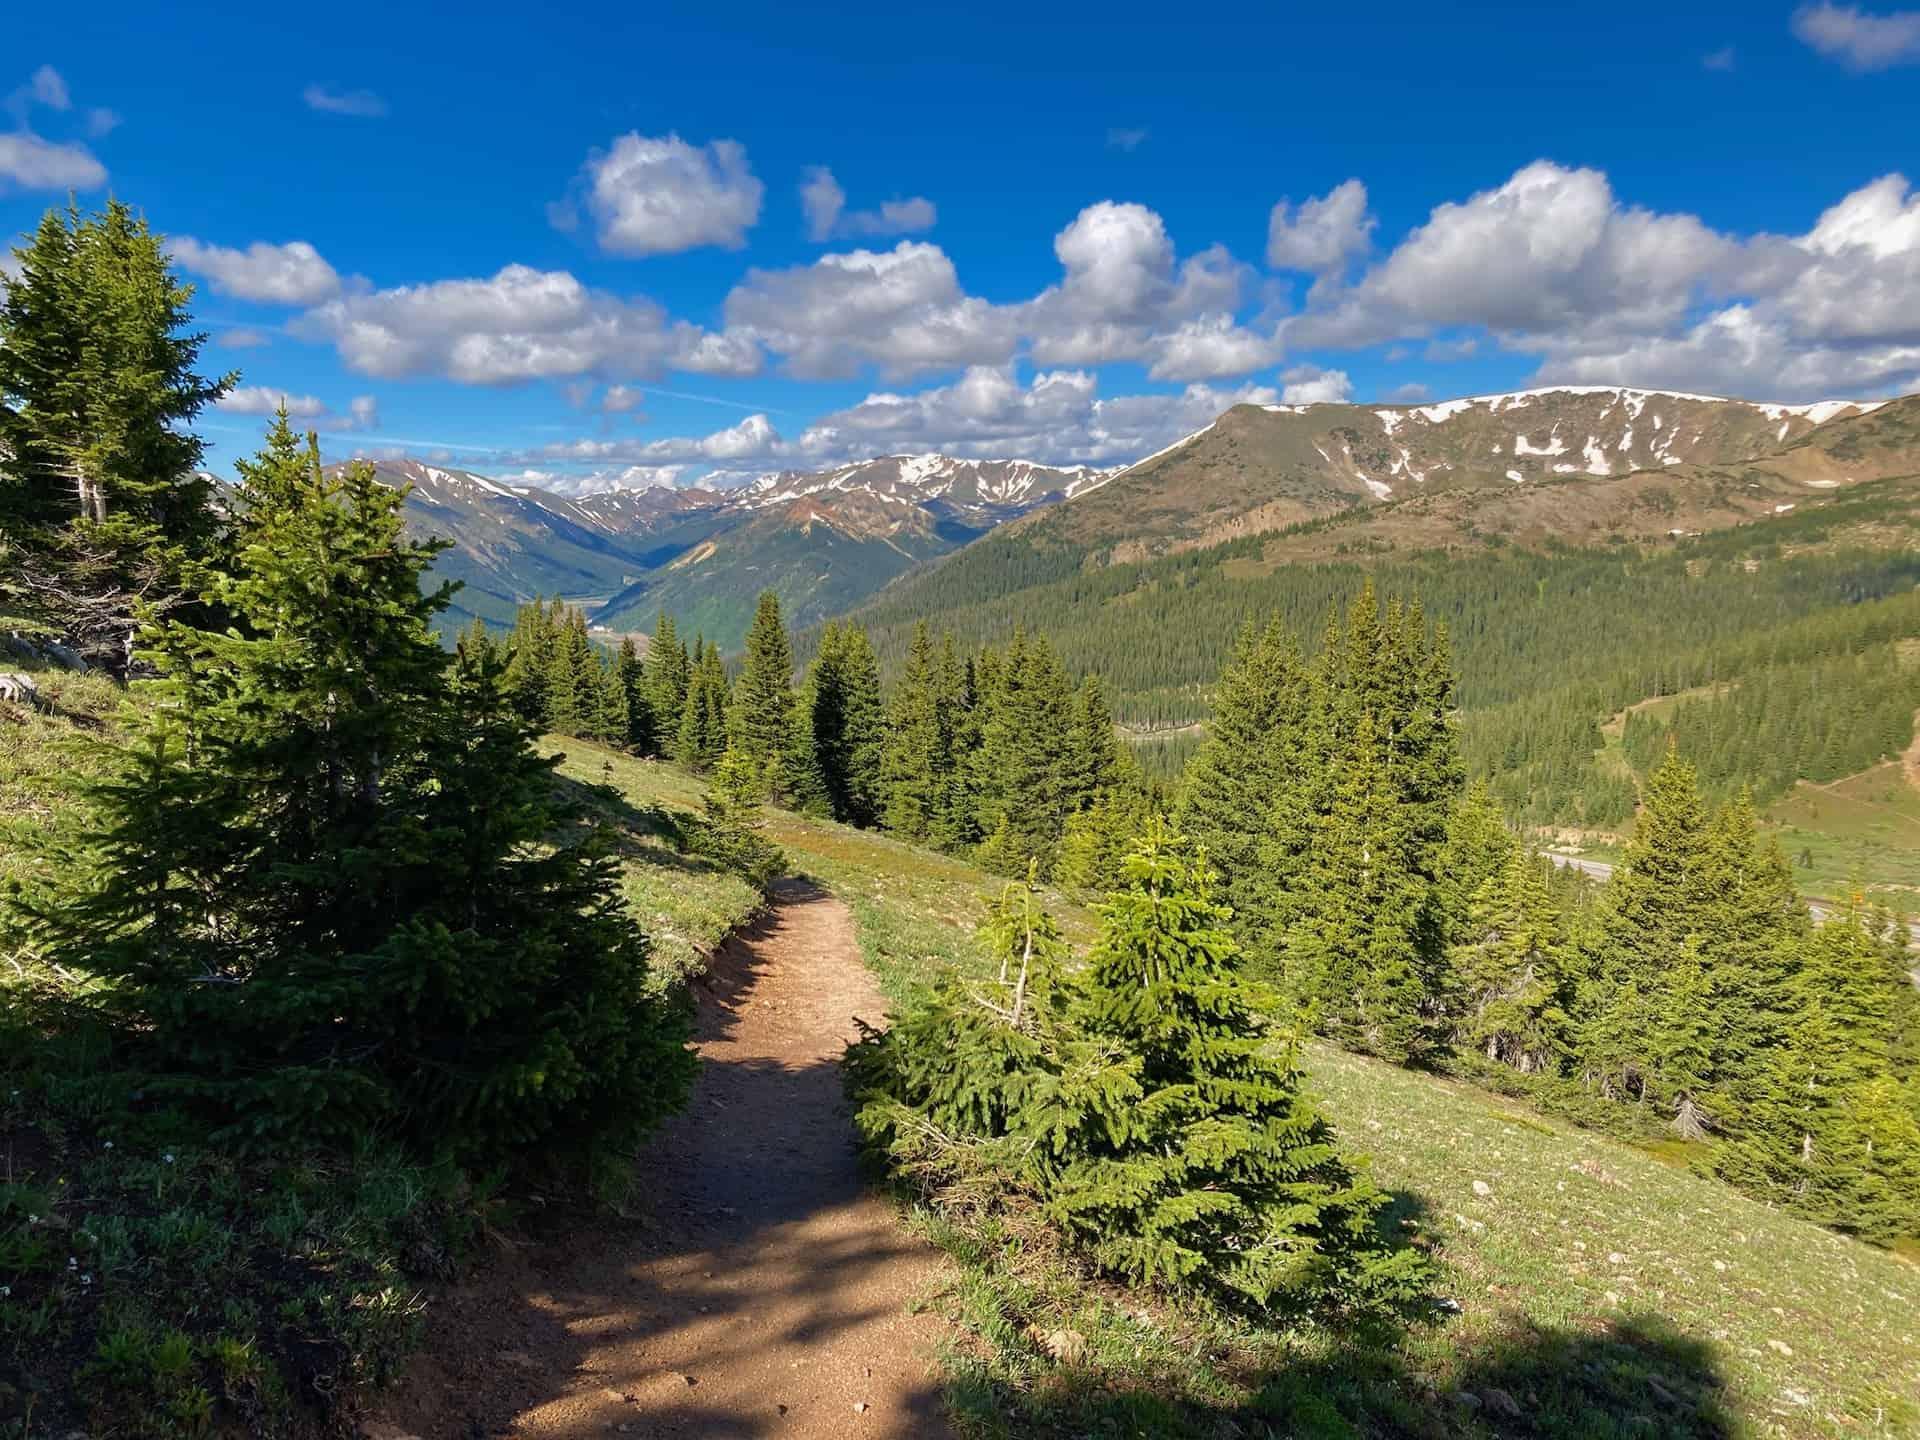 forest trail along mt. flora route